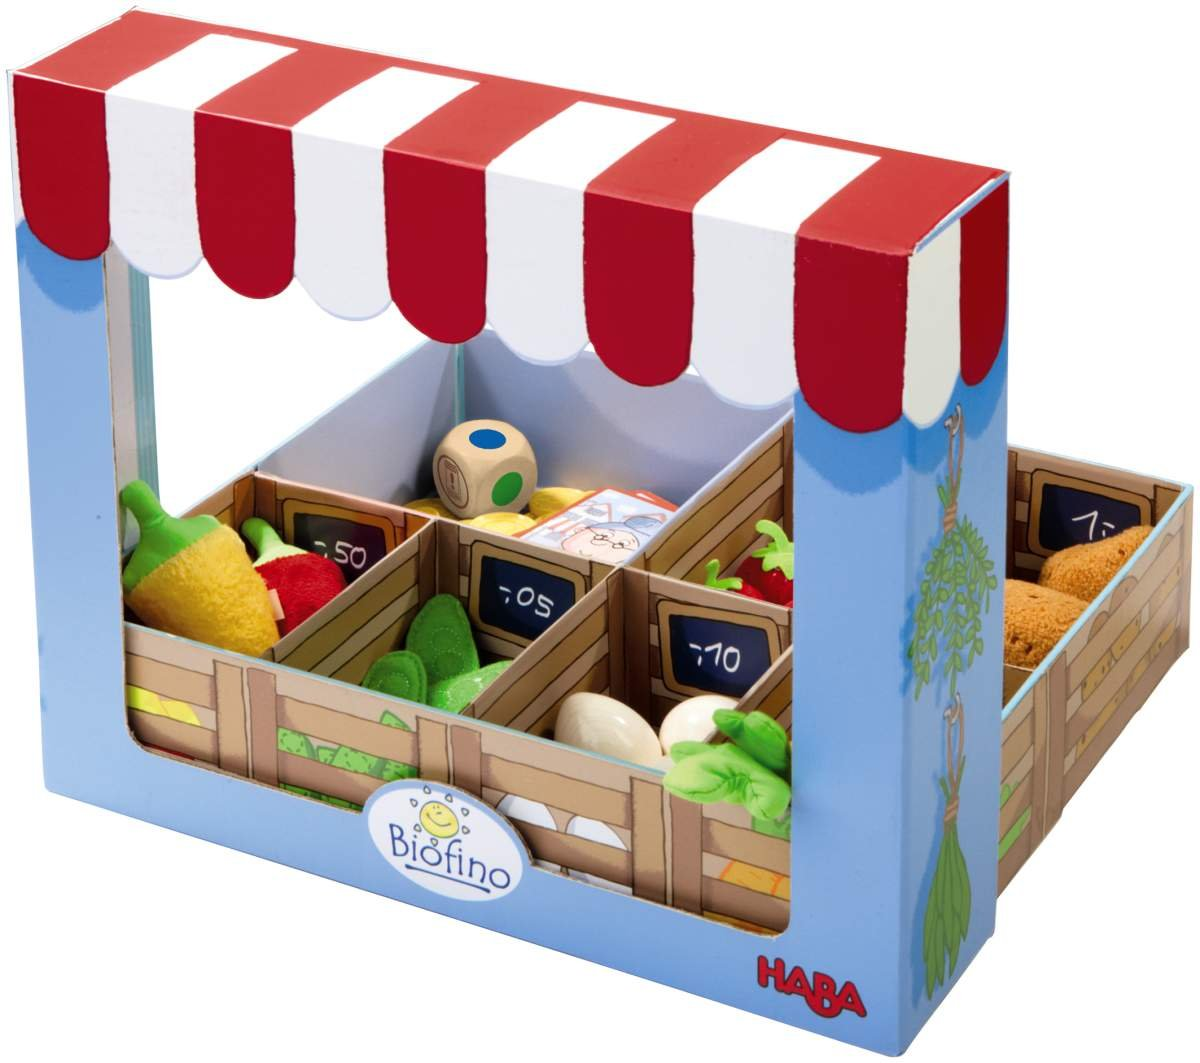 Kaufladen klappbar -HABA Biofino Möhrenglück